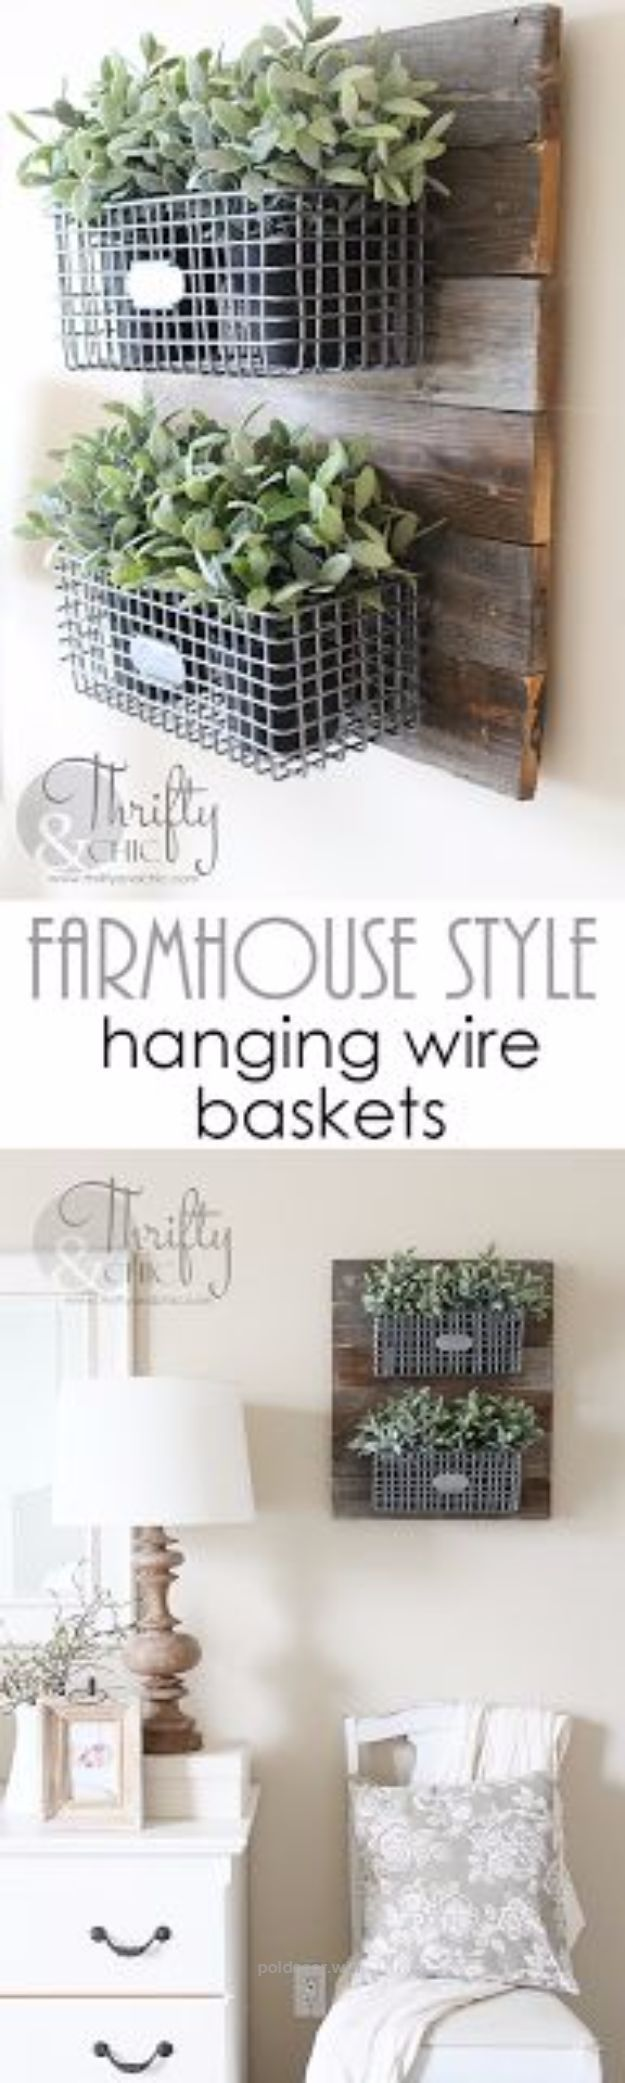 Best Country Decor Ideas - Farmhouse Style Hanging Wire Baskets - Rustic Farmhou #spookybasketideas